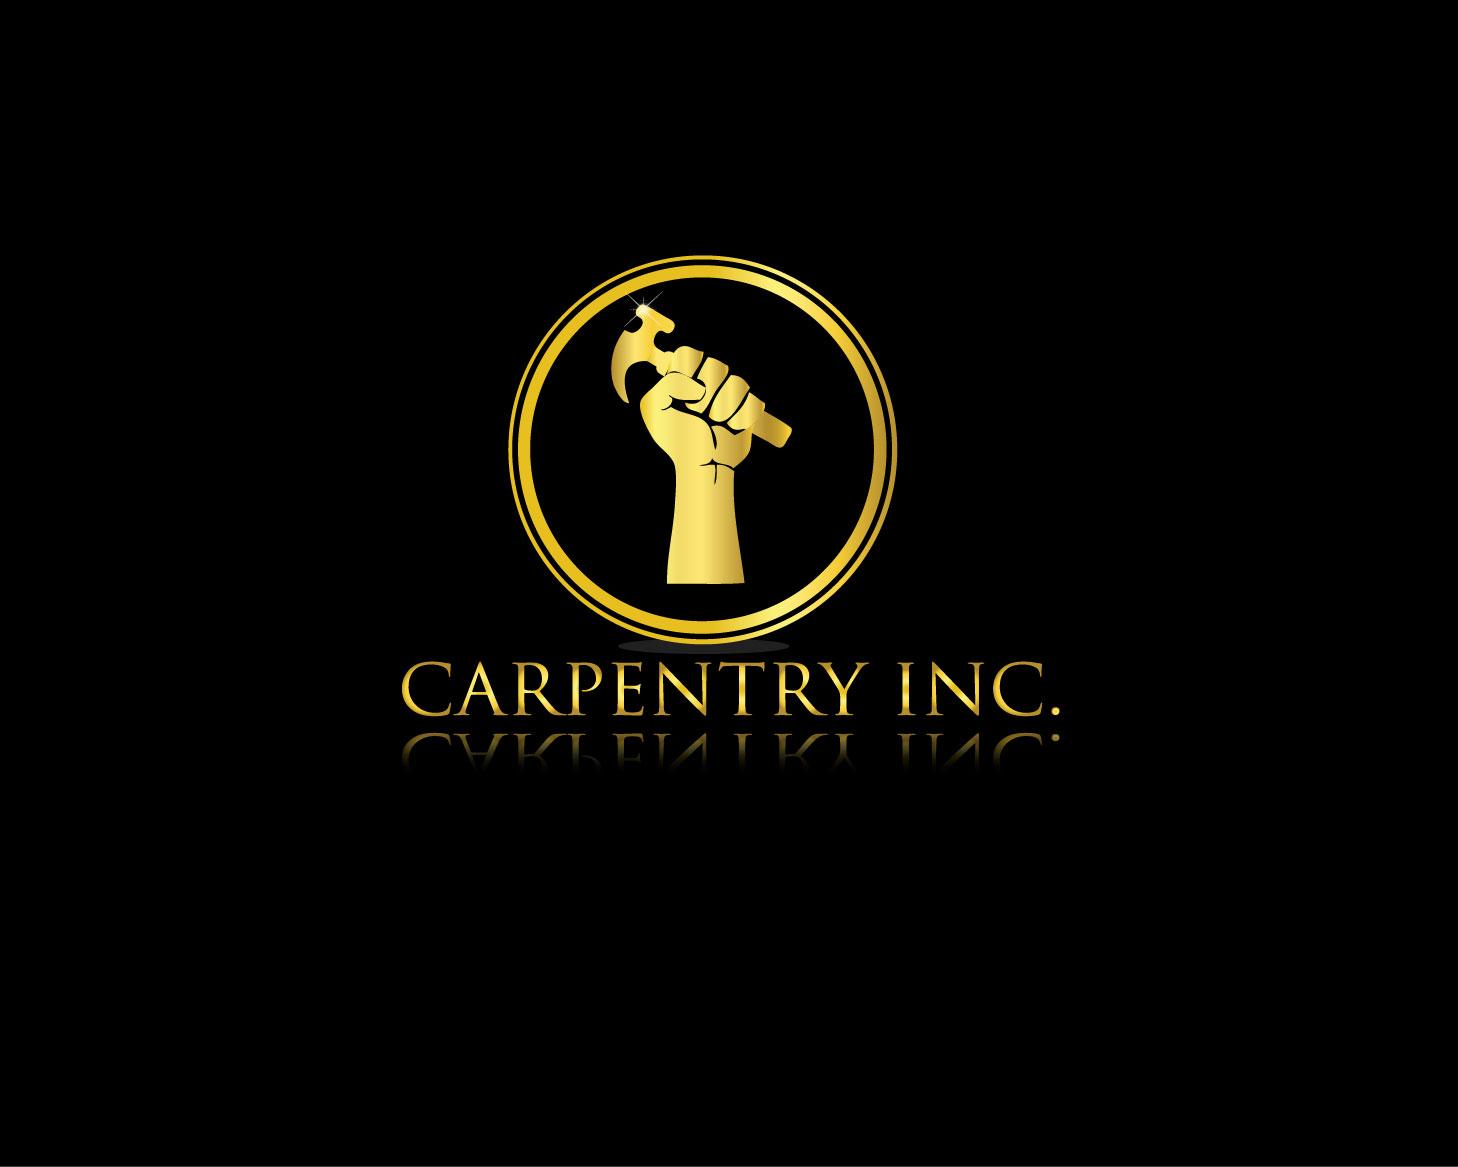 Logo Design by Rowel Samson - Entry No. 29 in the Logo Design Contest Creative Logo Design for Carpentry inc..